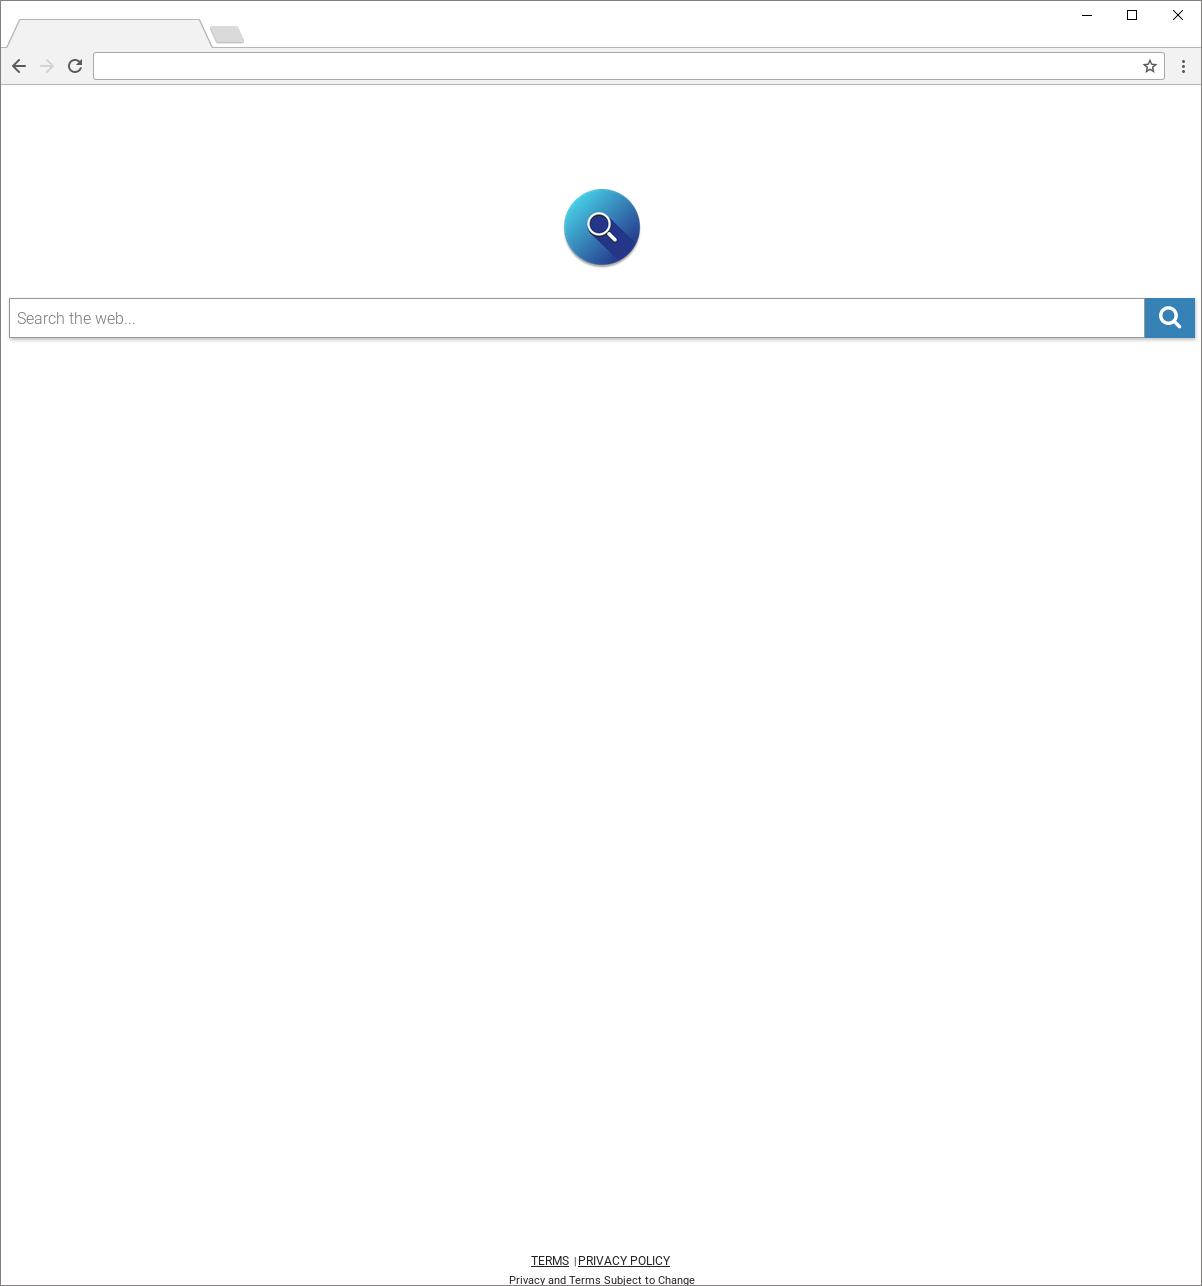 Smartsrch.com hijacker